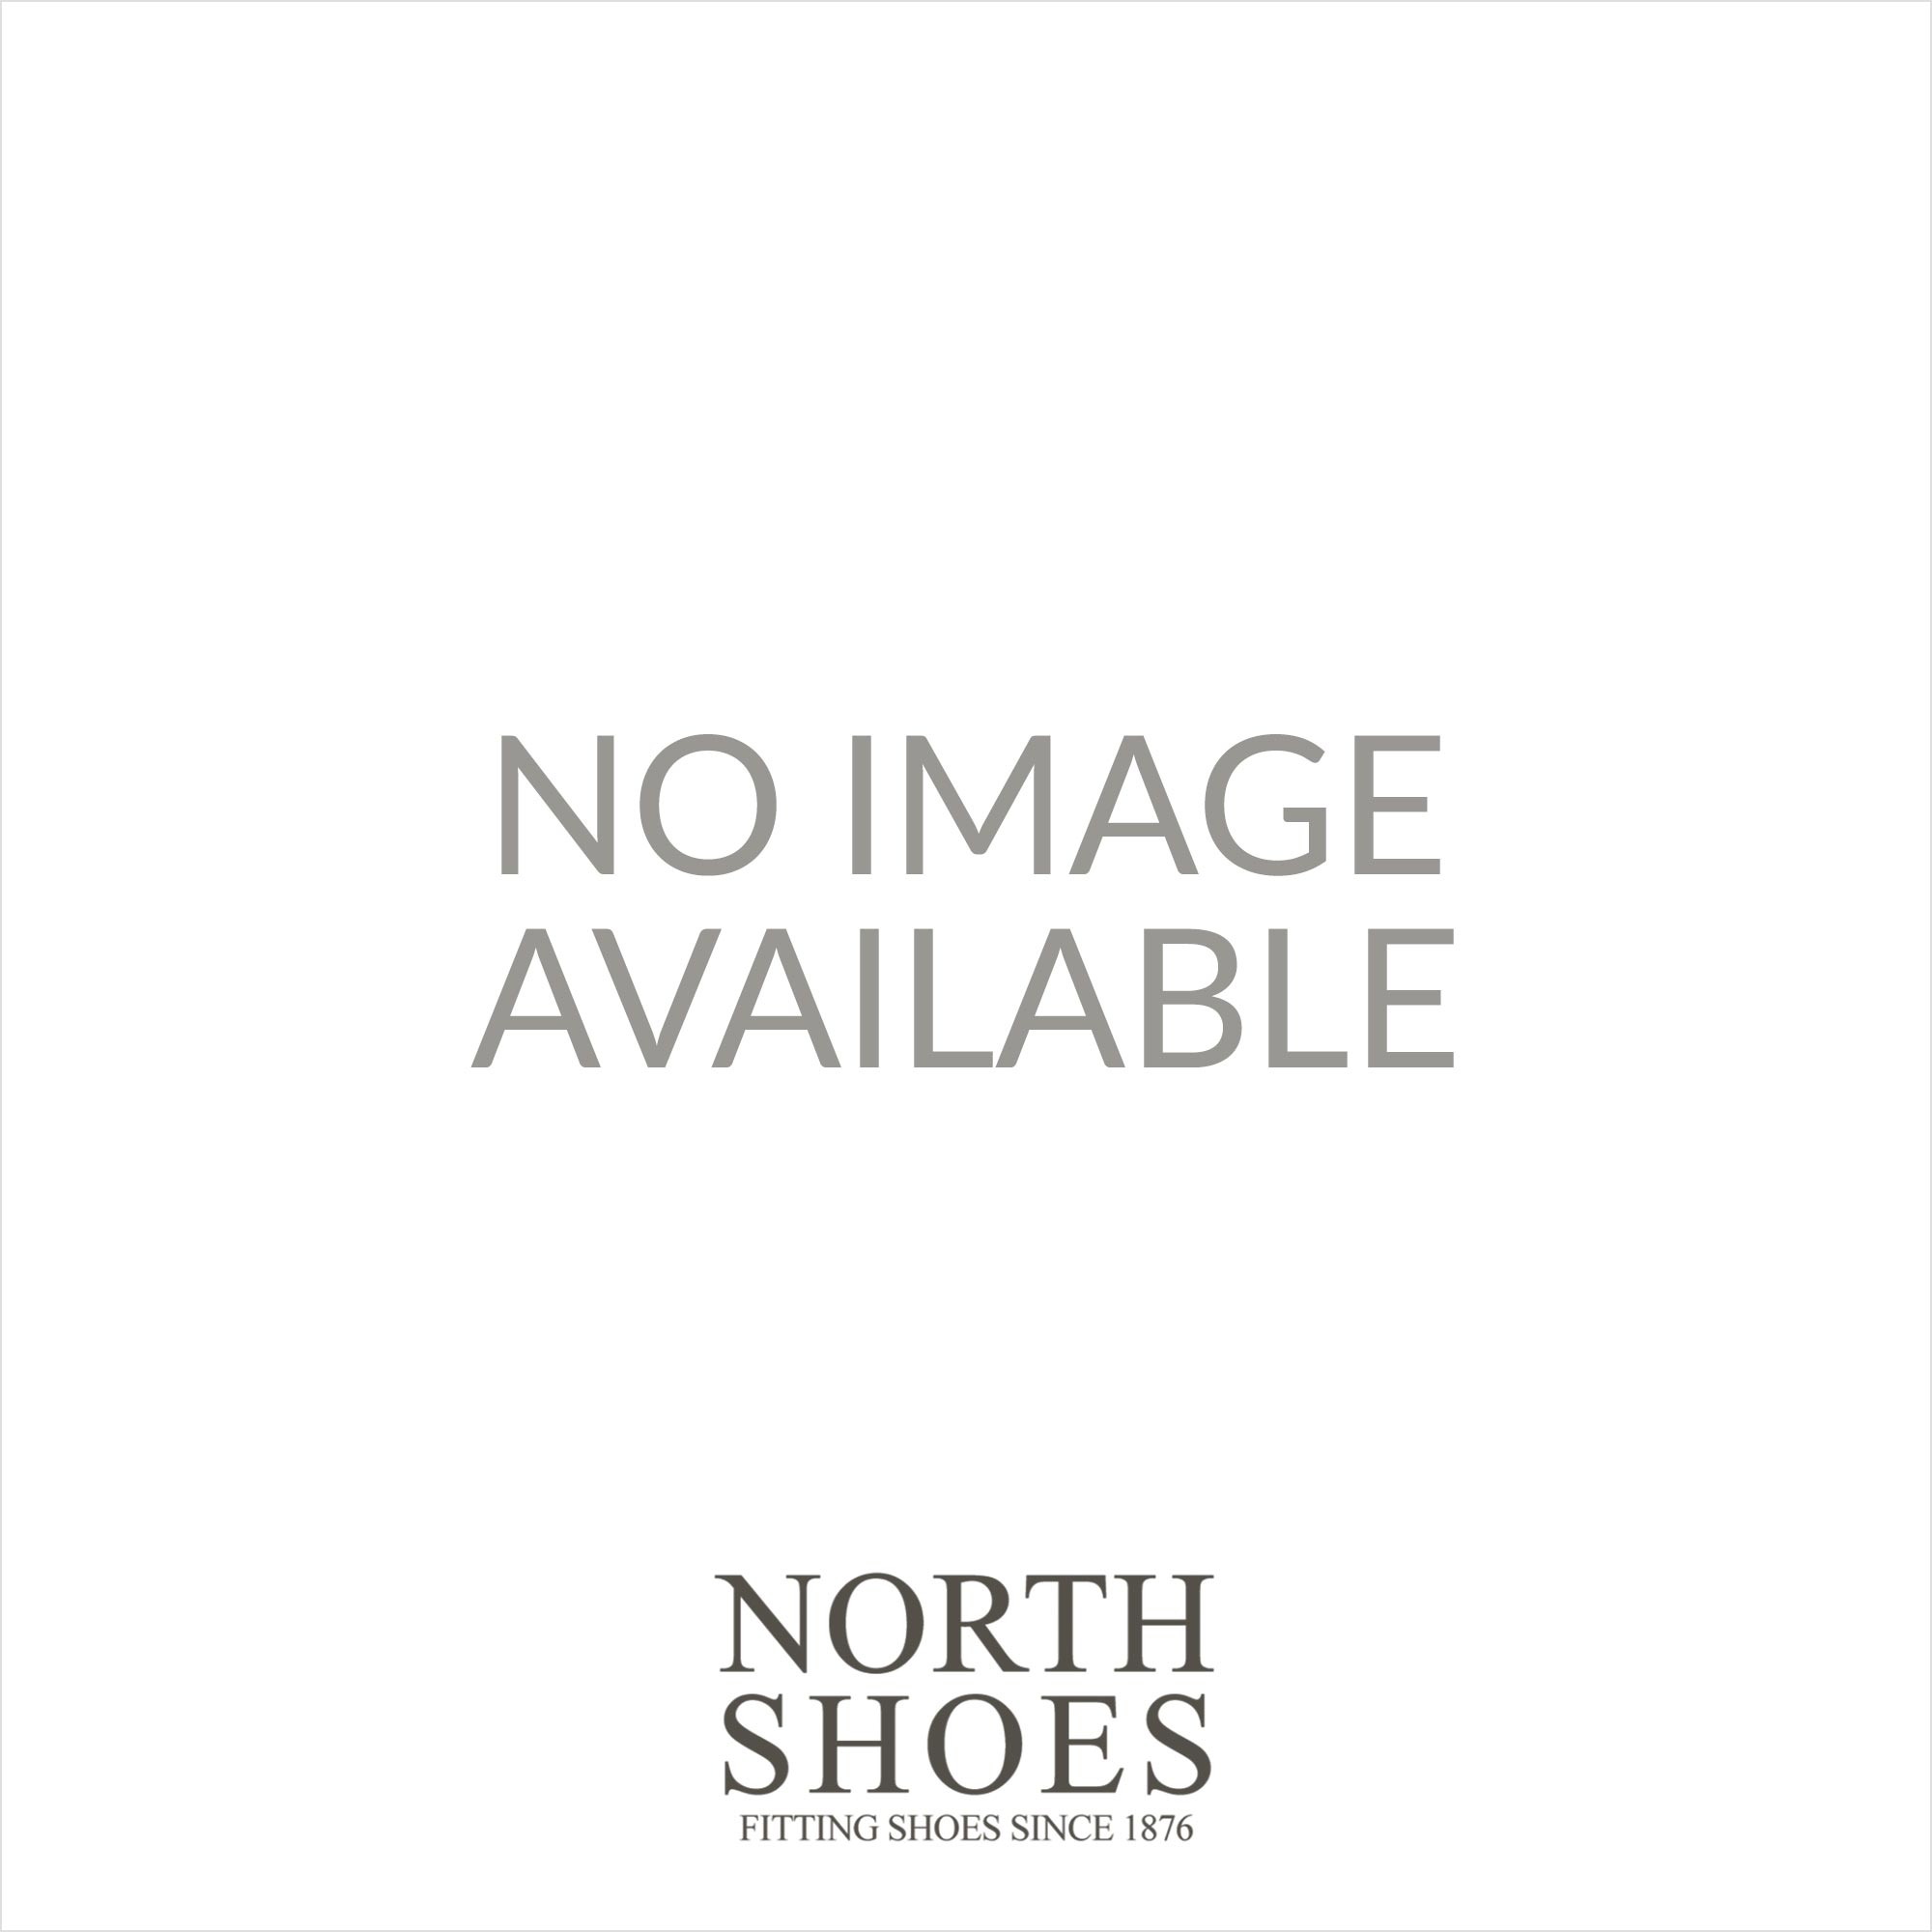 3591-03 Navy Suede Leather Womens Slip On Stiletto Heel Court Shoe